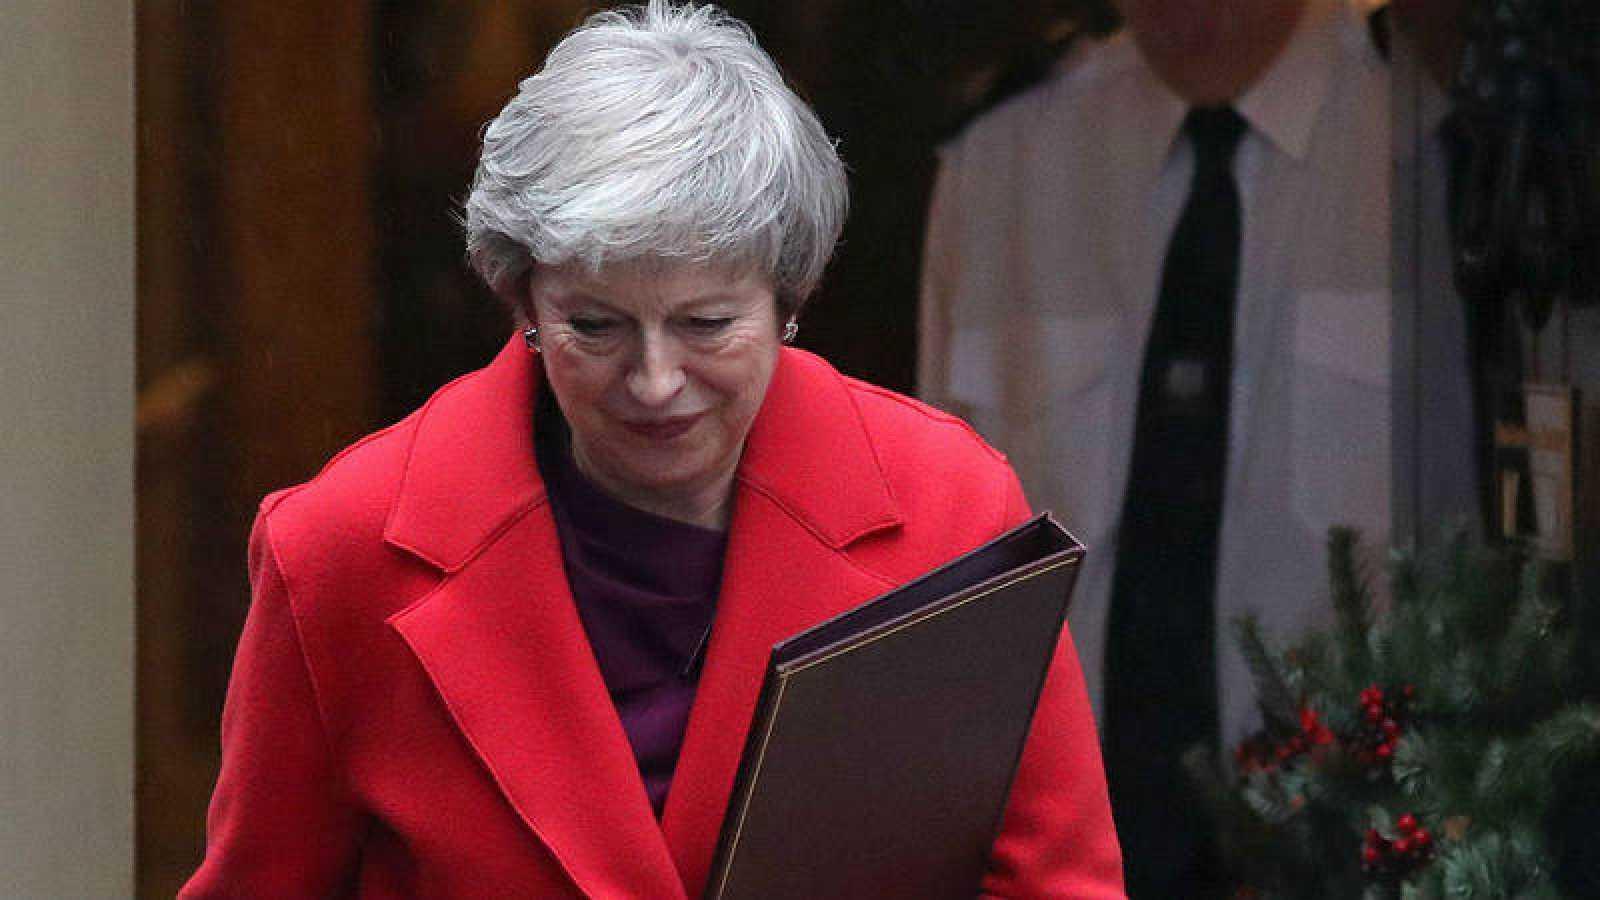 La primera ministra británica, Theresa May, saliendo del 10 de Downing Street.